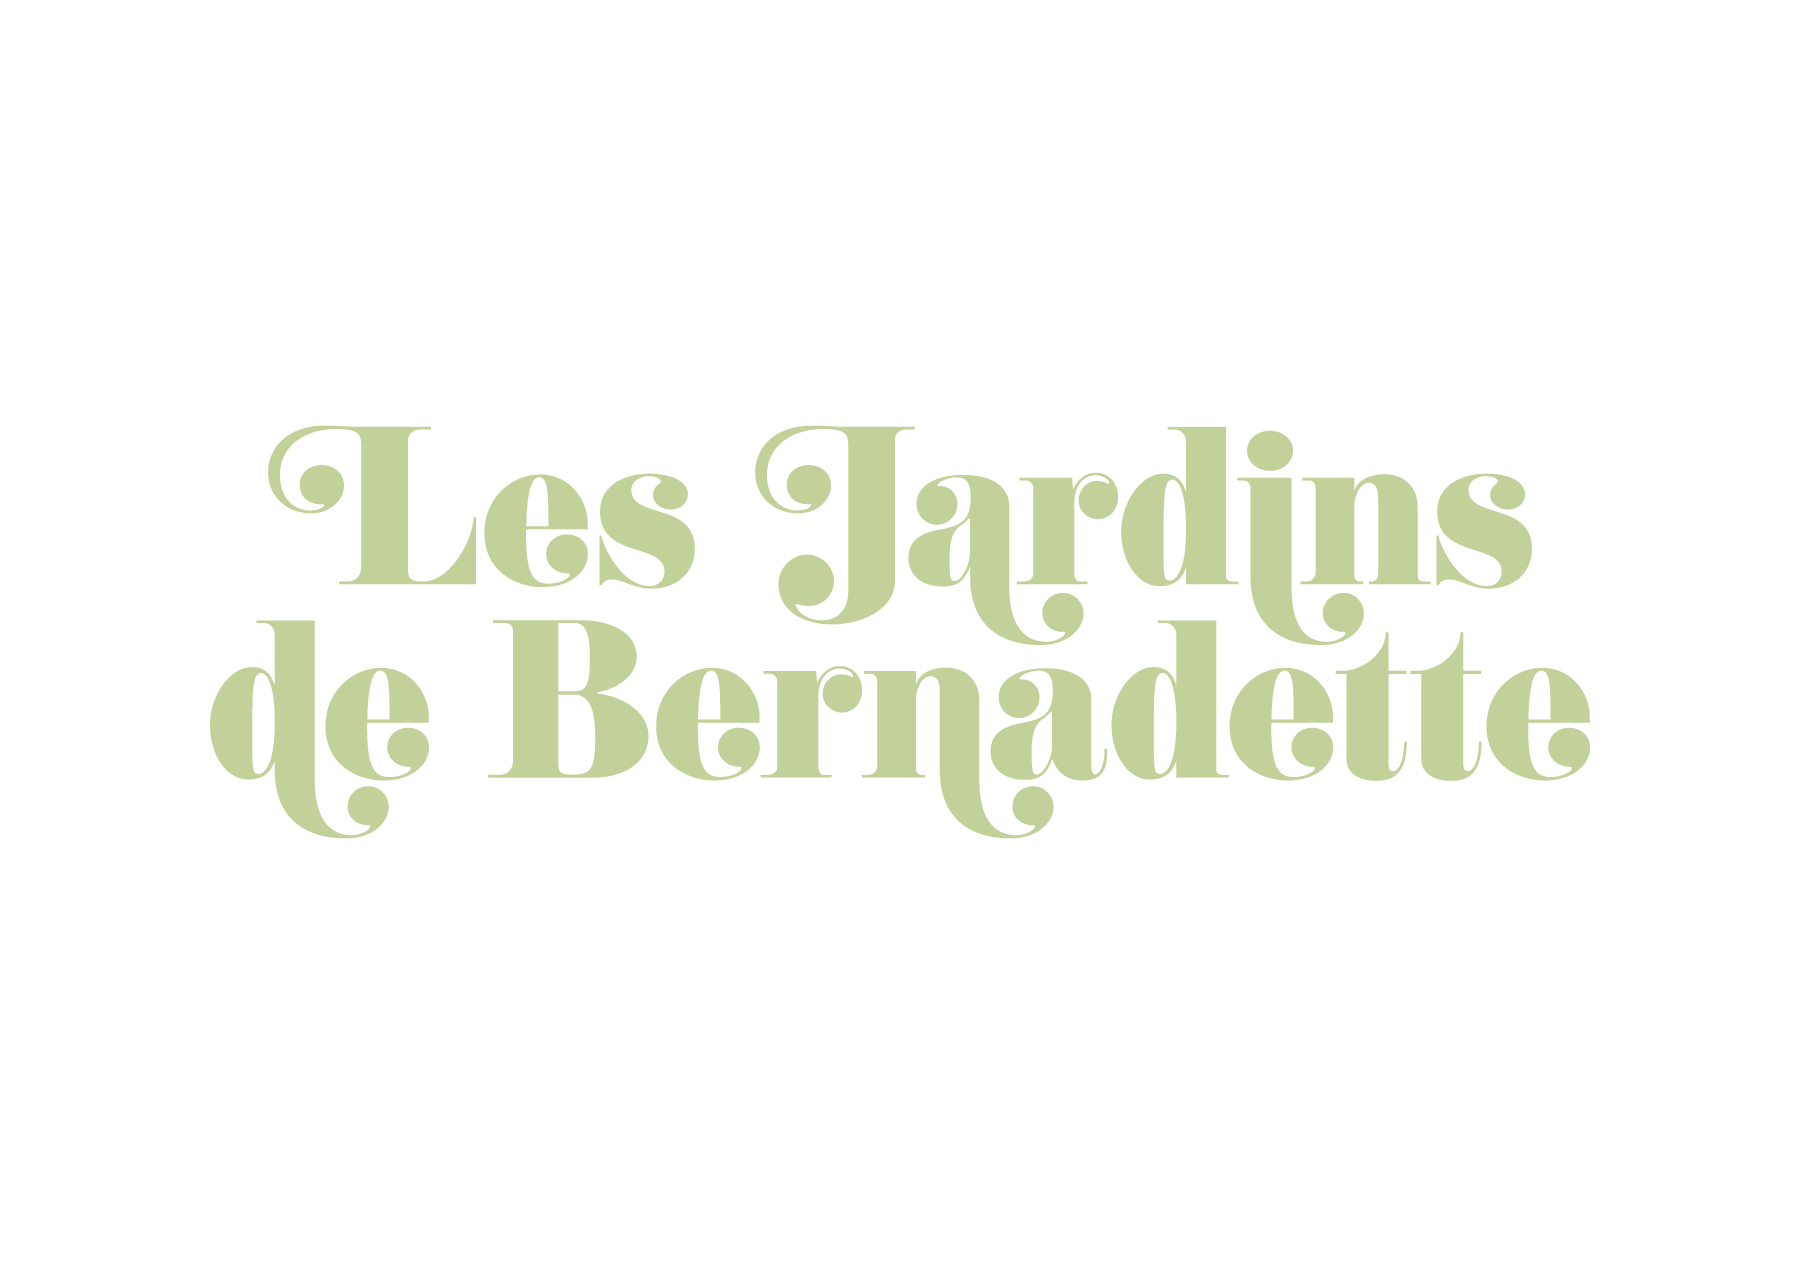 les jardins de bernadette – josselin tourette – logo – vertical – vert3